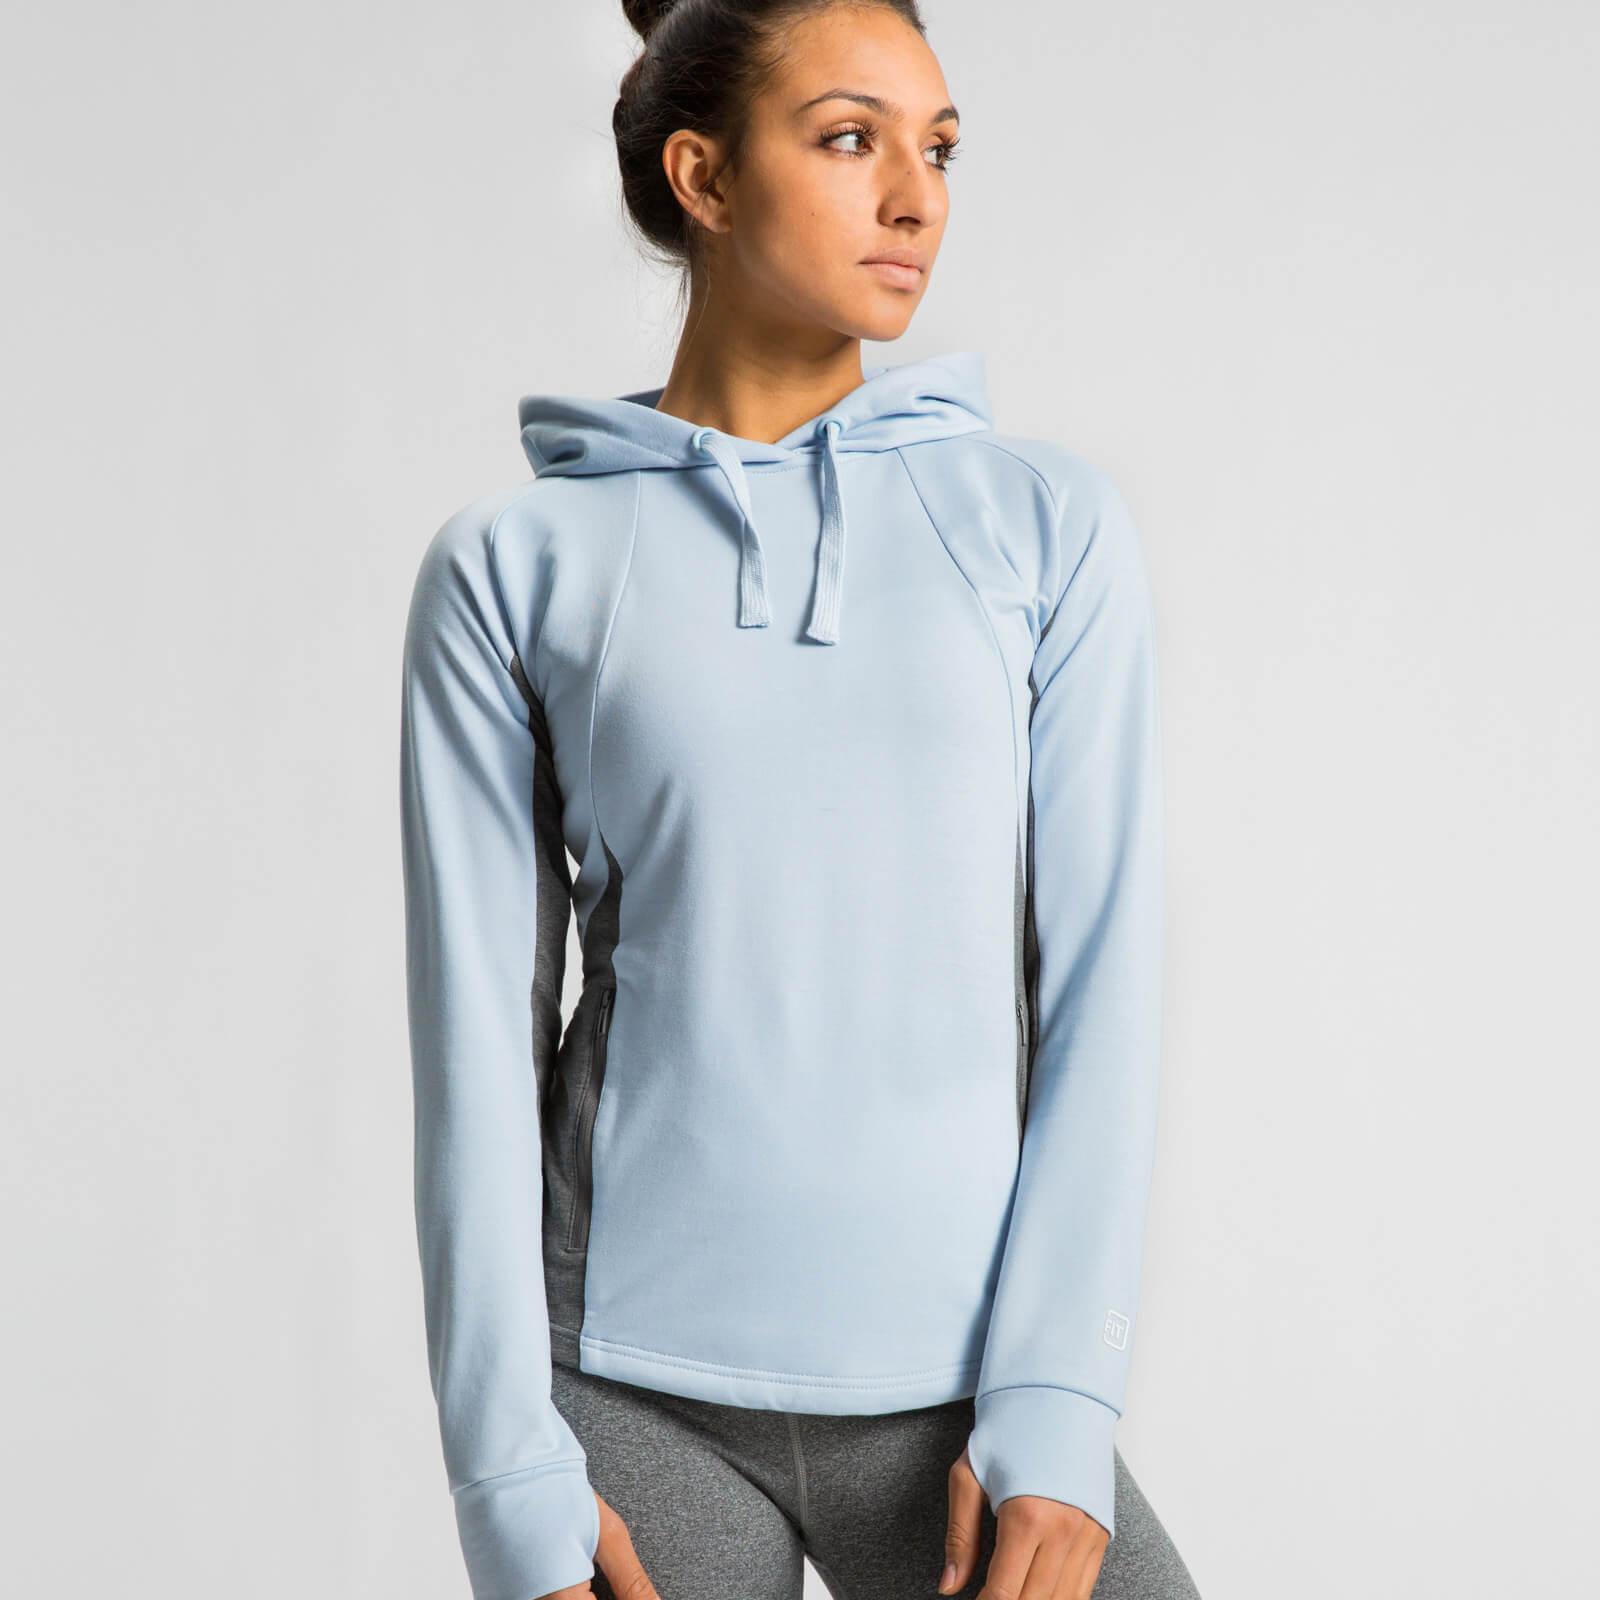 IdealFit Superlite Pullover Hoodie - Light Blue - L - Blue